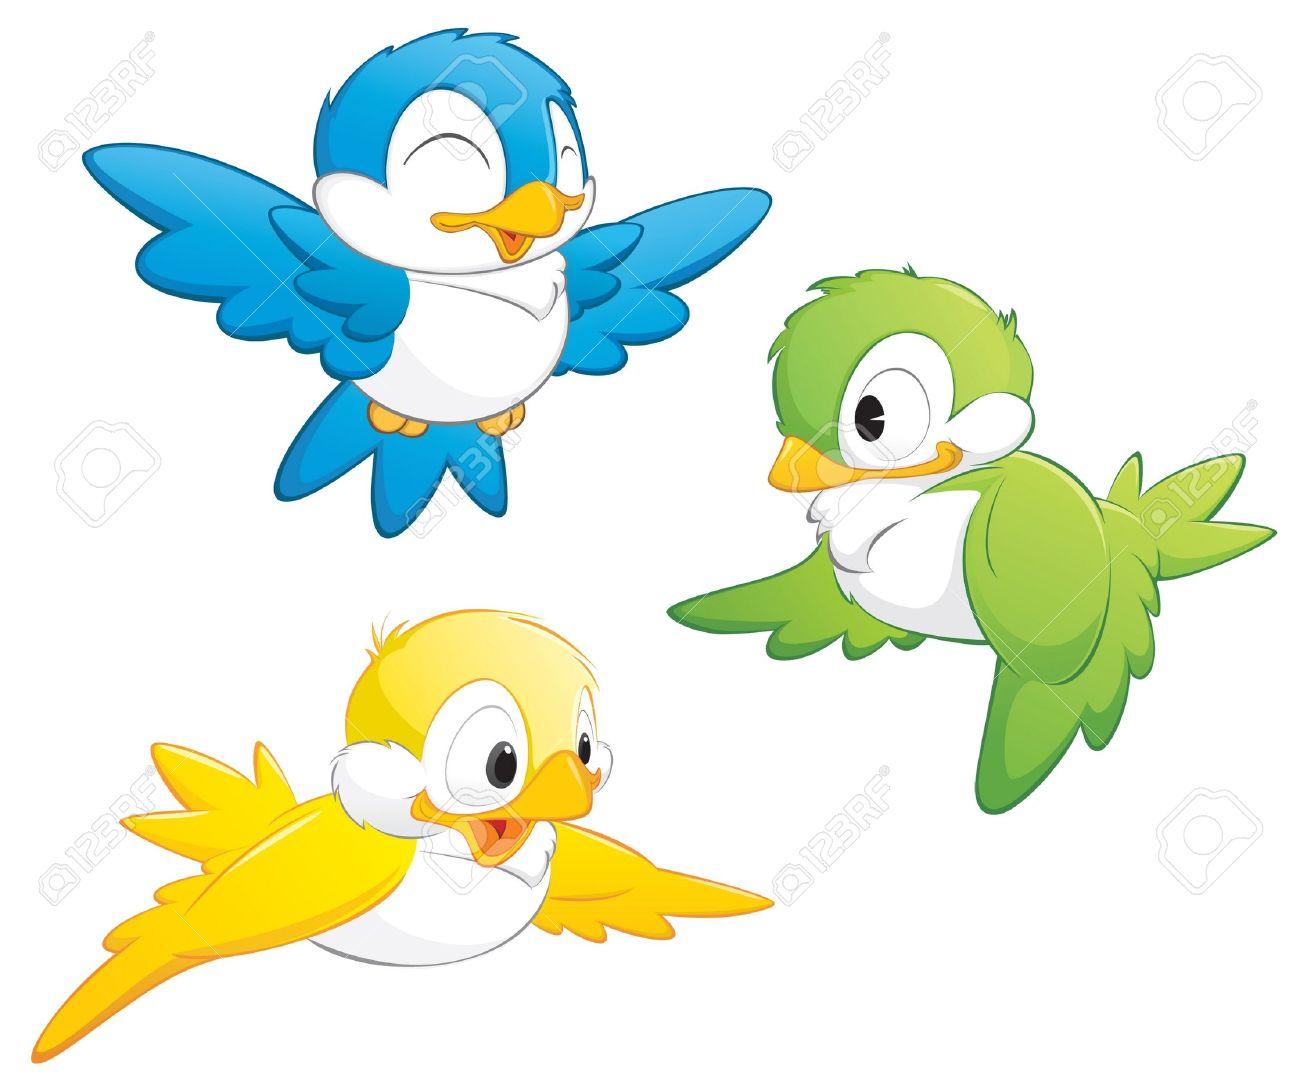 Cute cartoon birds in three colors for design element Stock Vector - 10837215